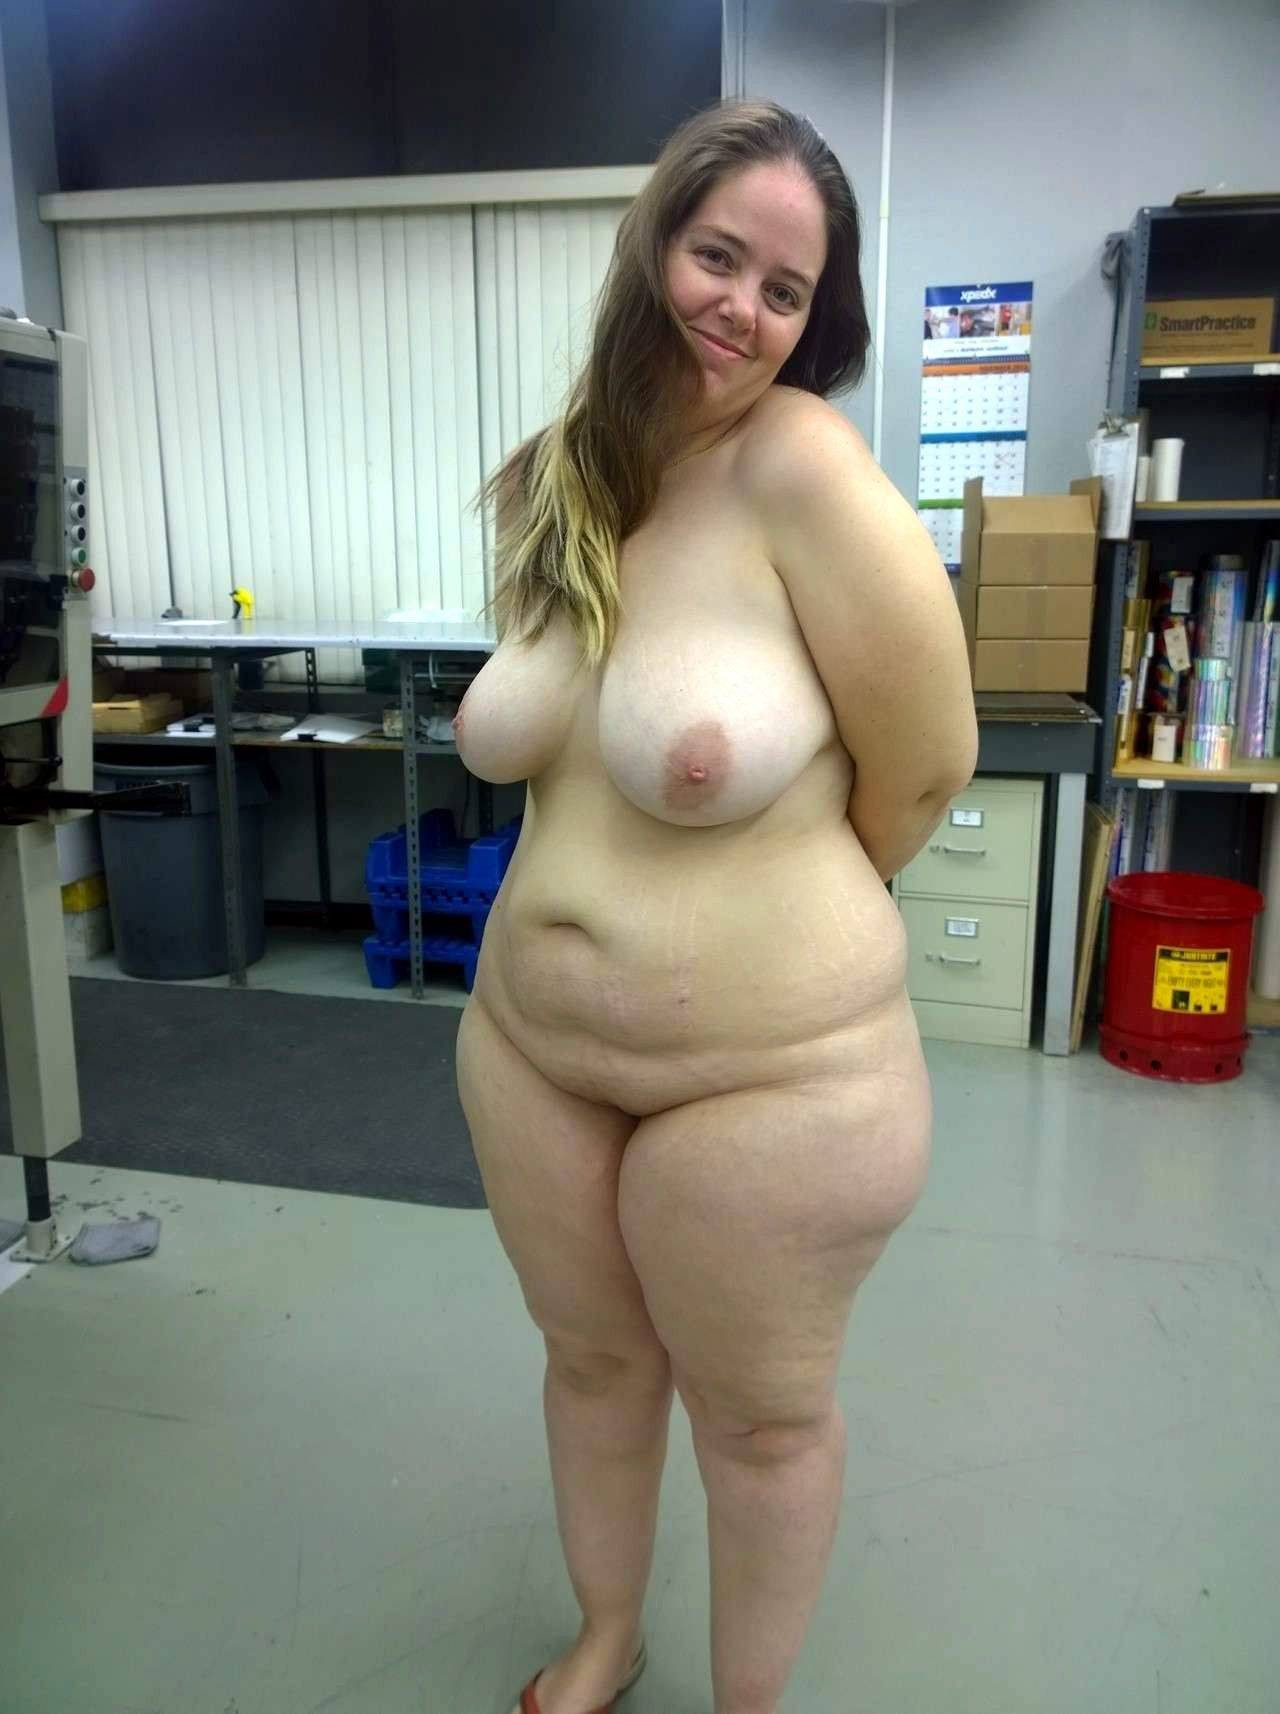 Shy chubby busty girl